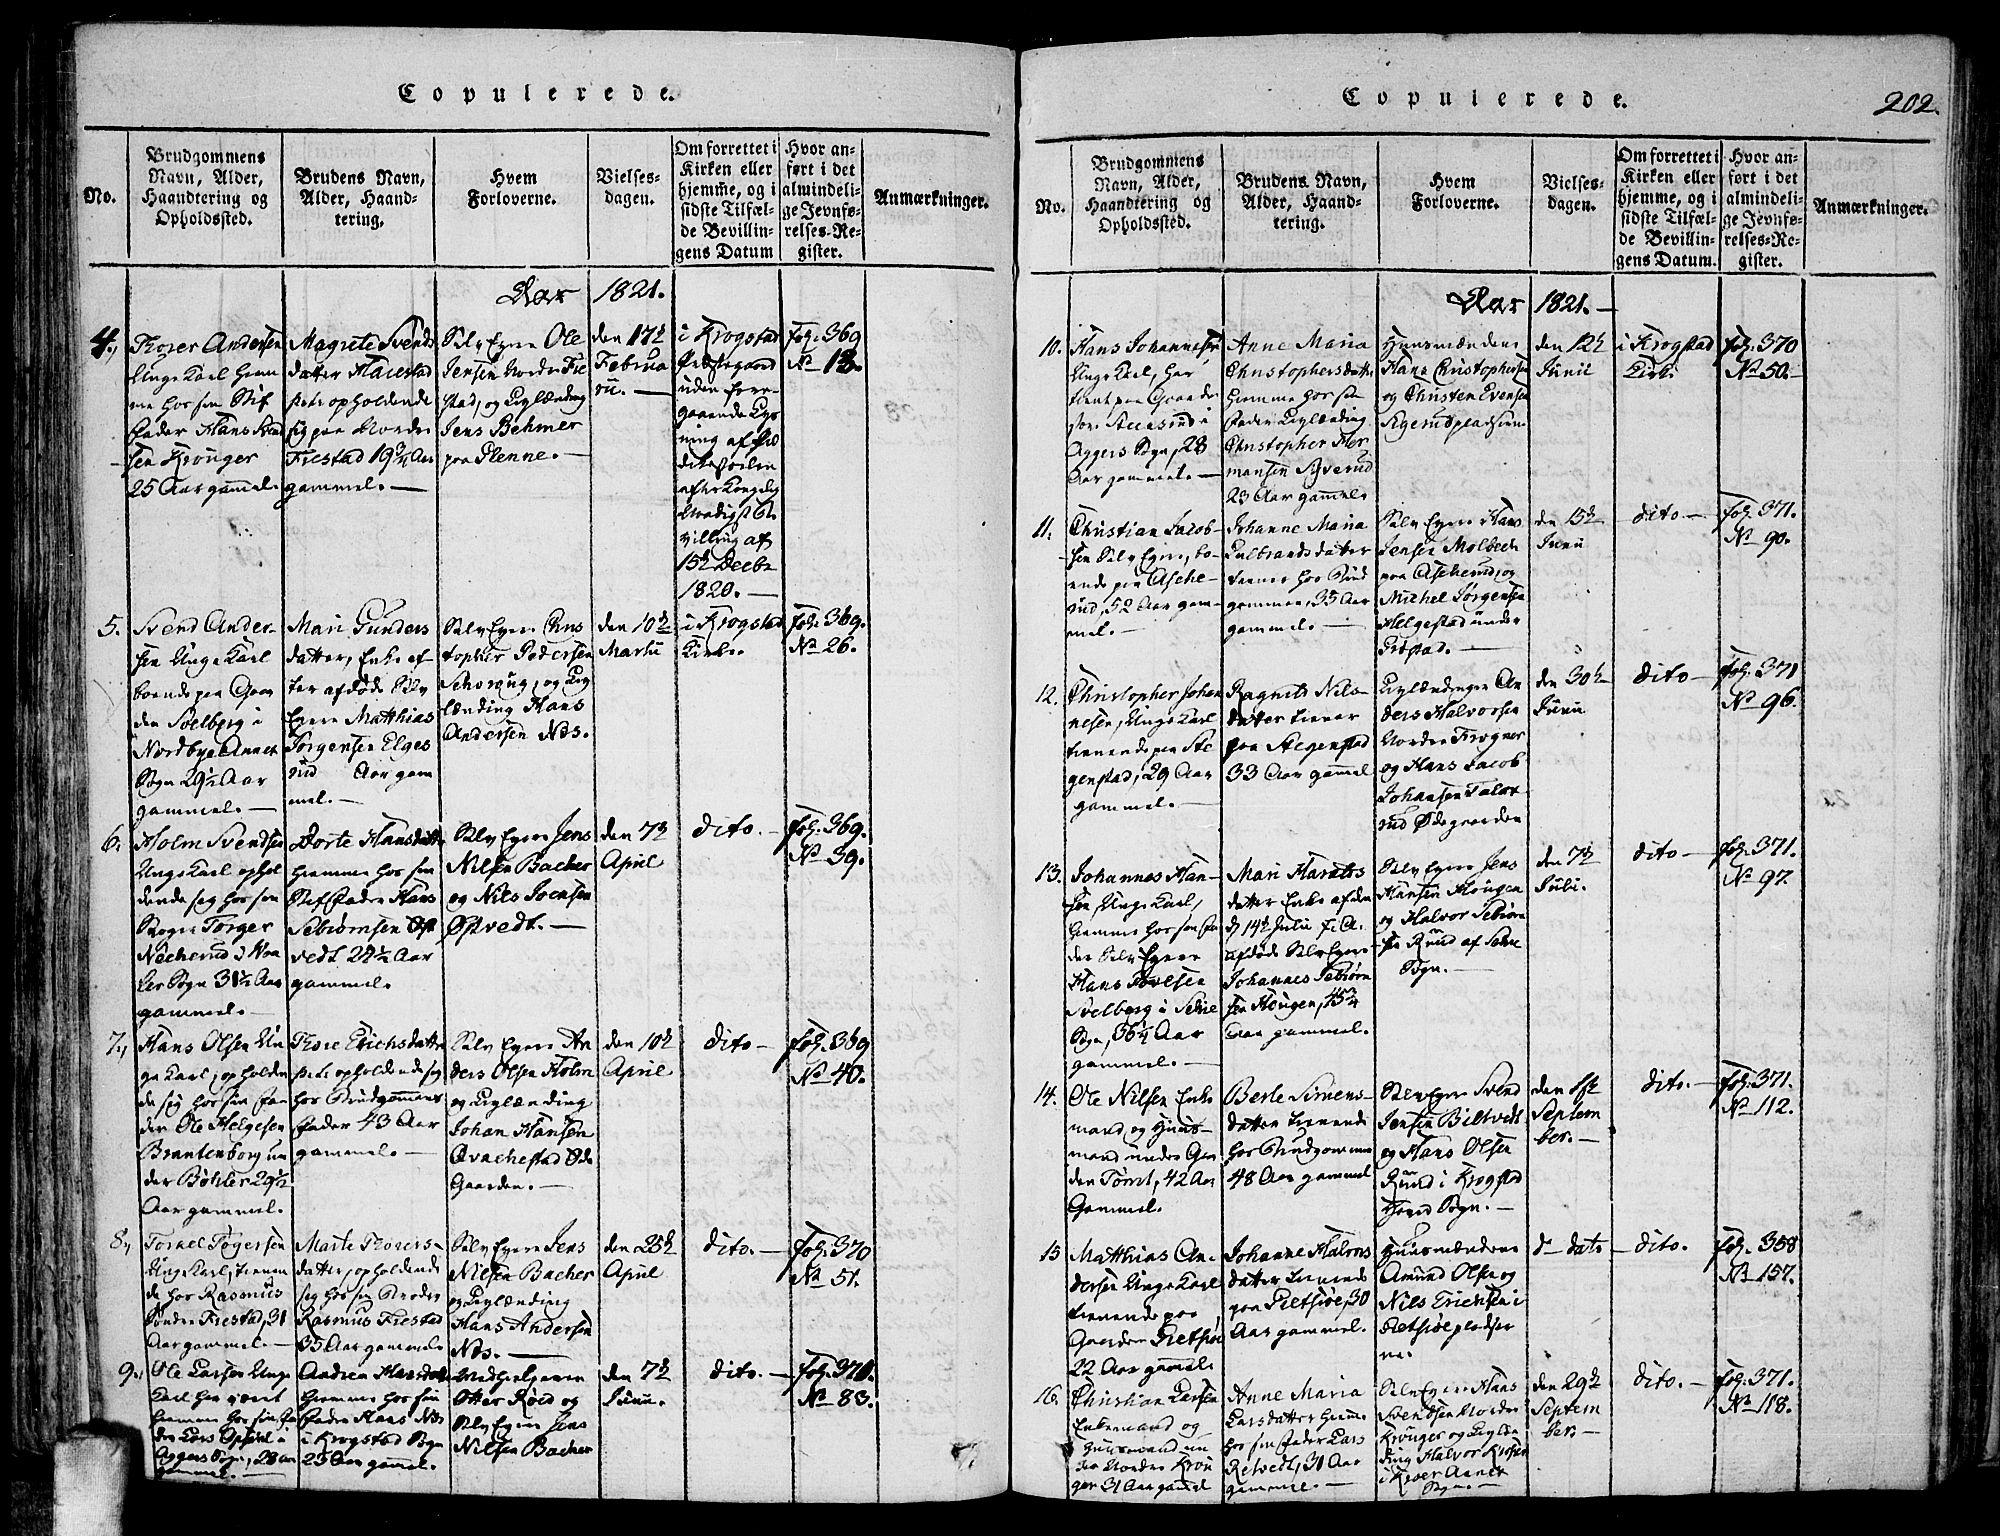 SAO, Kråkstad prestekontor Kirkebøker, F/Fa/L0003: Ministerialbok nr. I 3, 1813-1824, s. 202